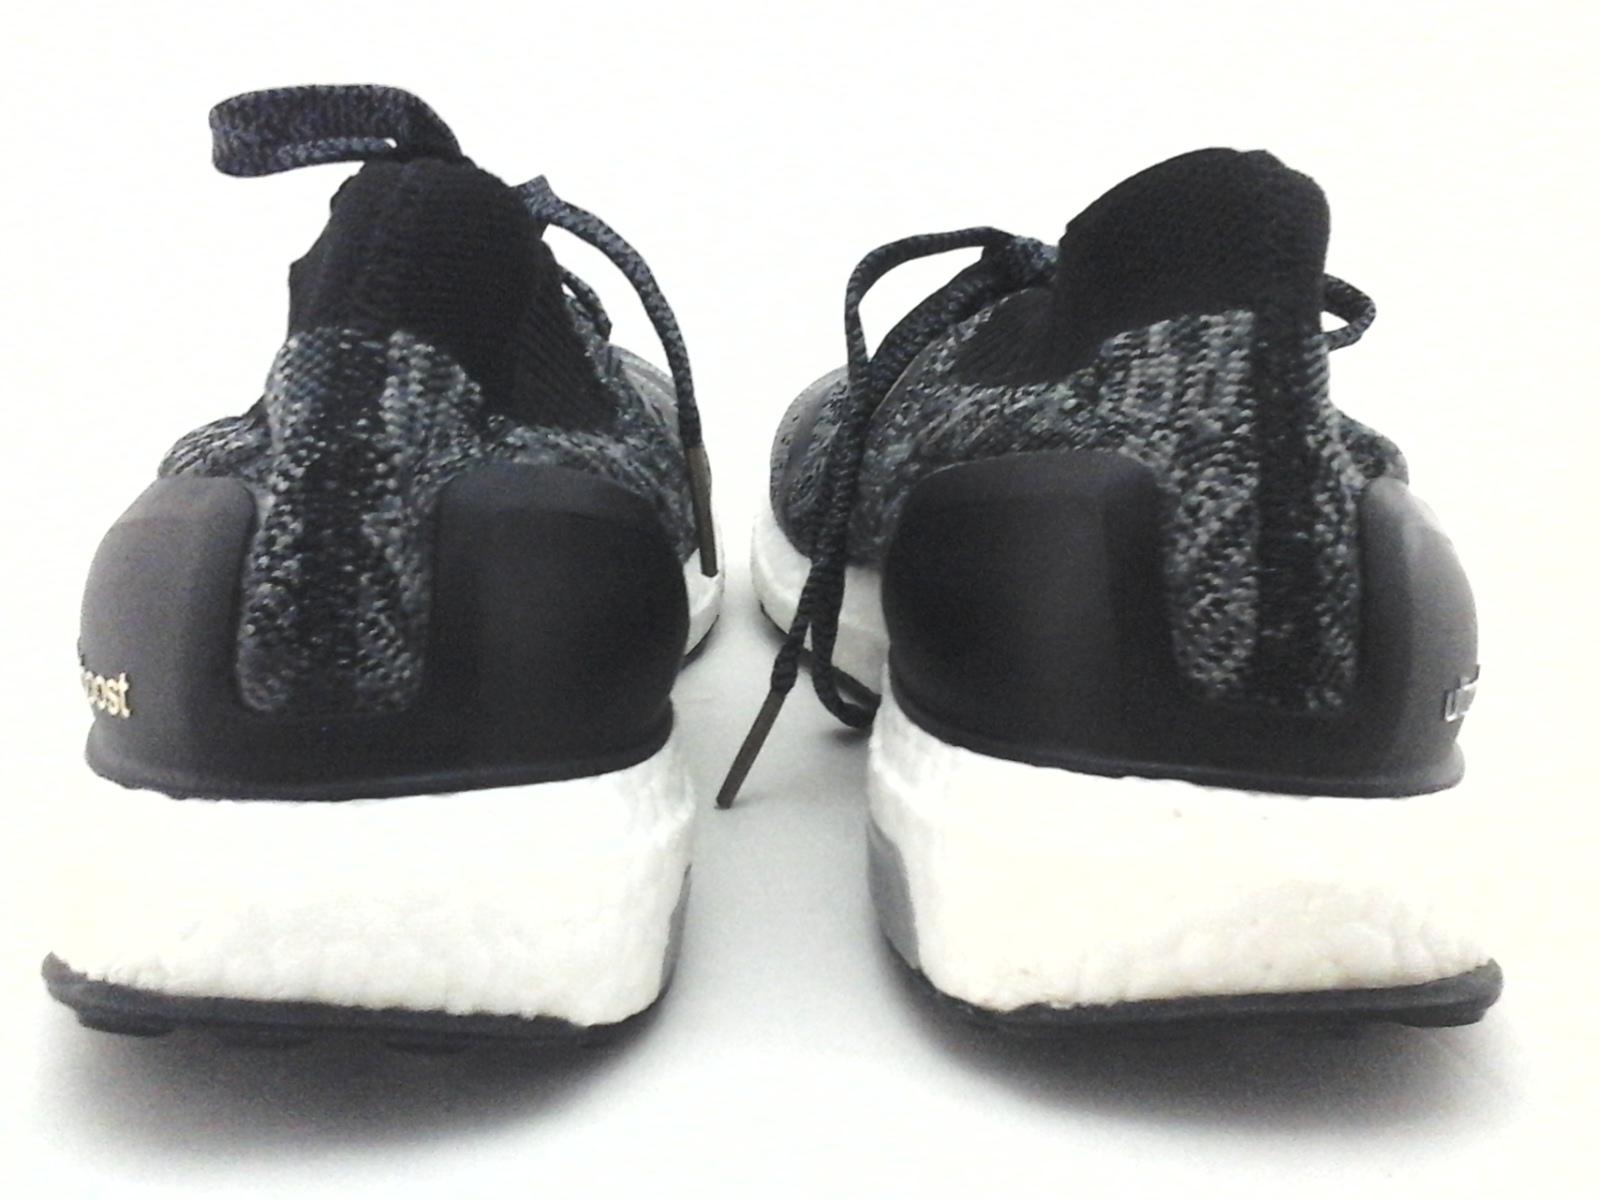 42de314946fc4 ADIDAS UltraBoost Running Shoes Black Knit Uncaged BB3900 Mens US 12.5  47  1 3